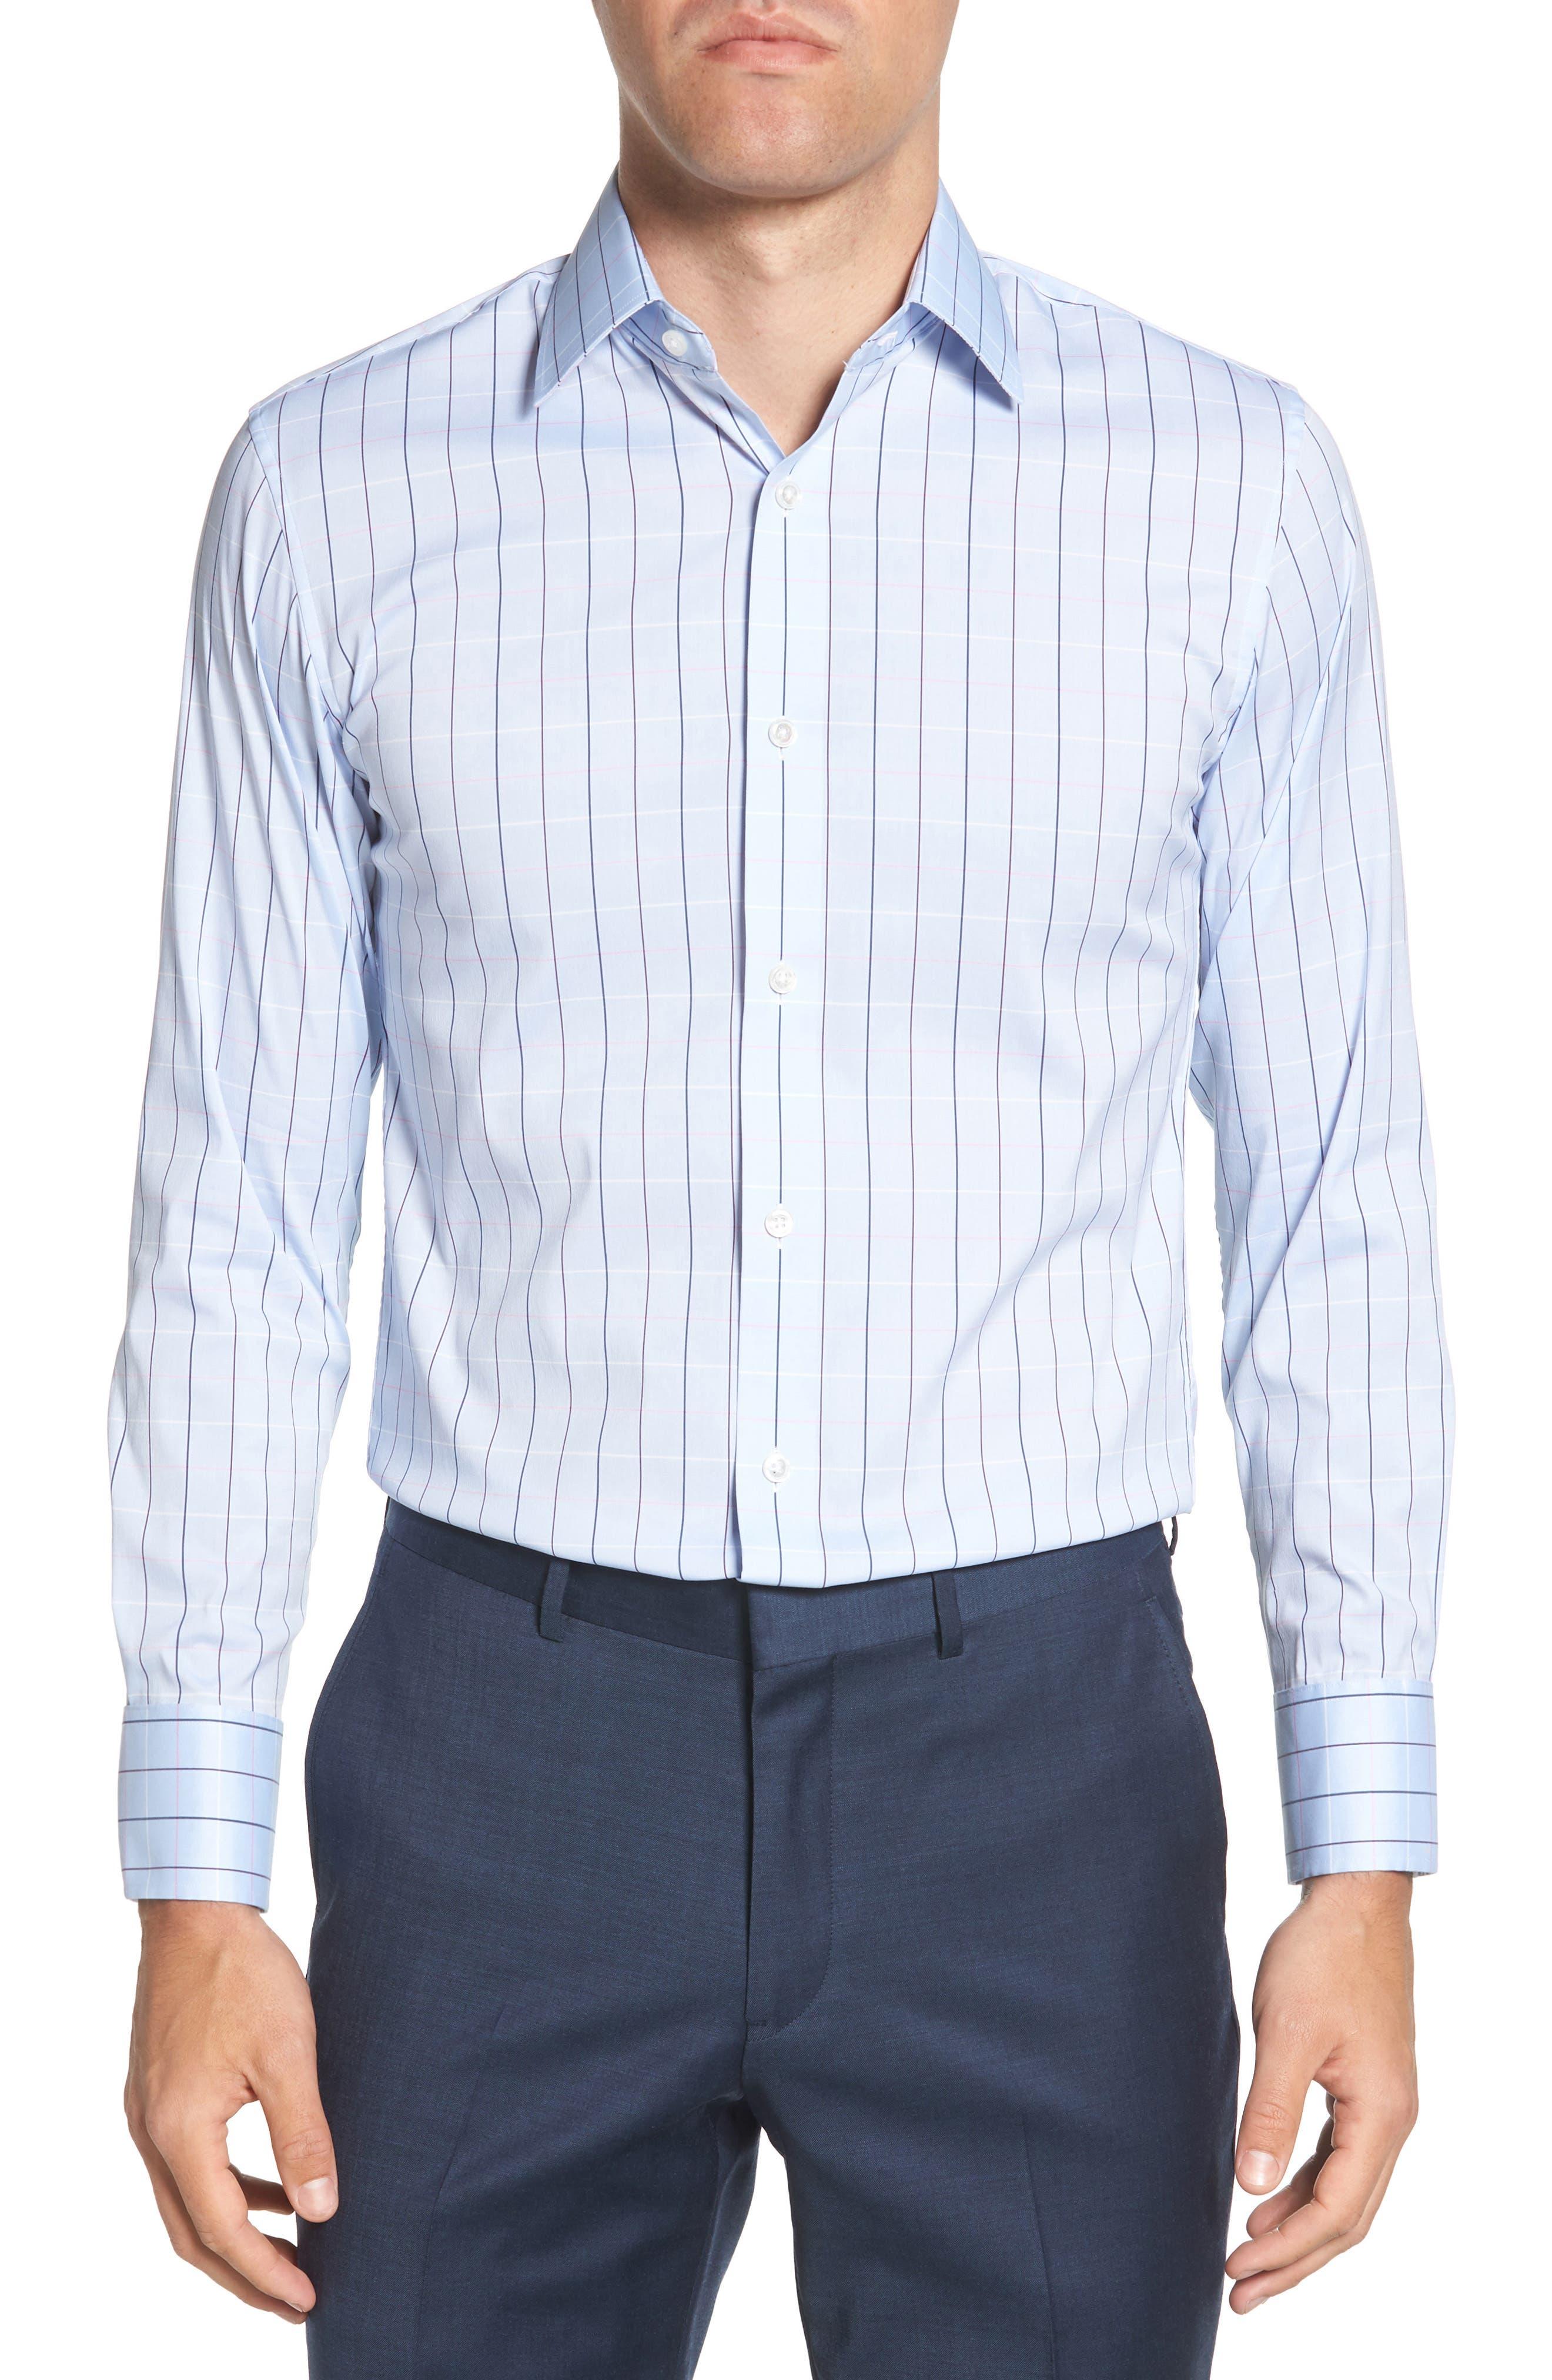 Jetsetter Slim Fit Stretch Check Dress Shirt,                             Main thumbnail 1, color,                             400